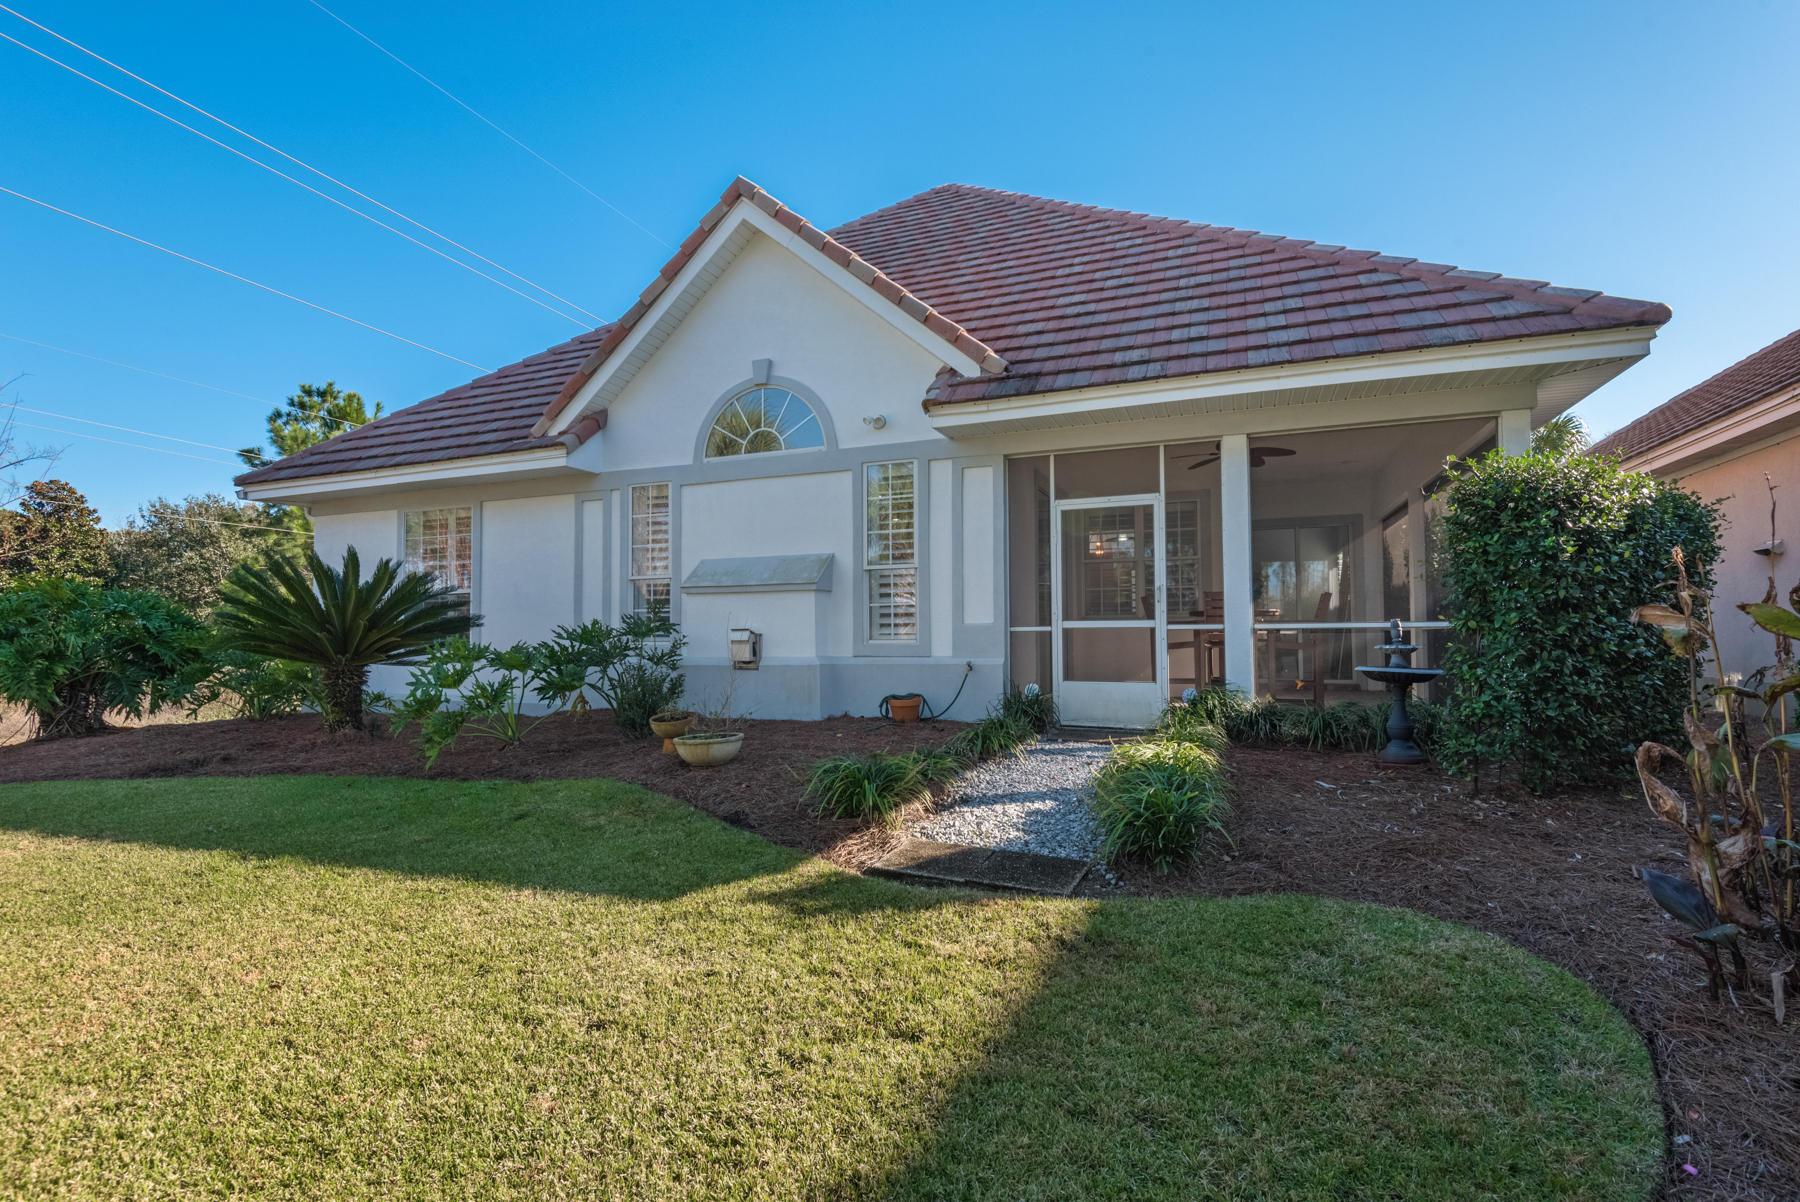 Photo of home for sale at 4603 Sailmaker, Destin FL